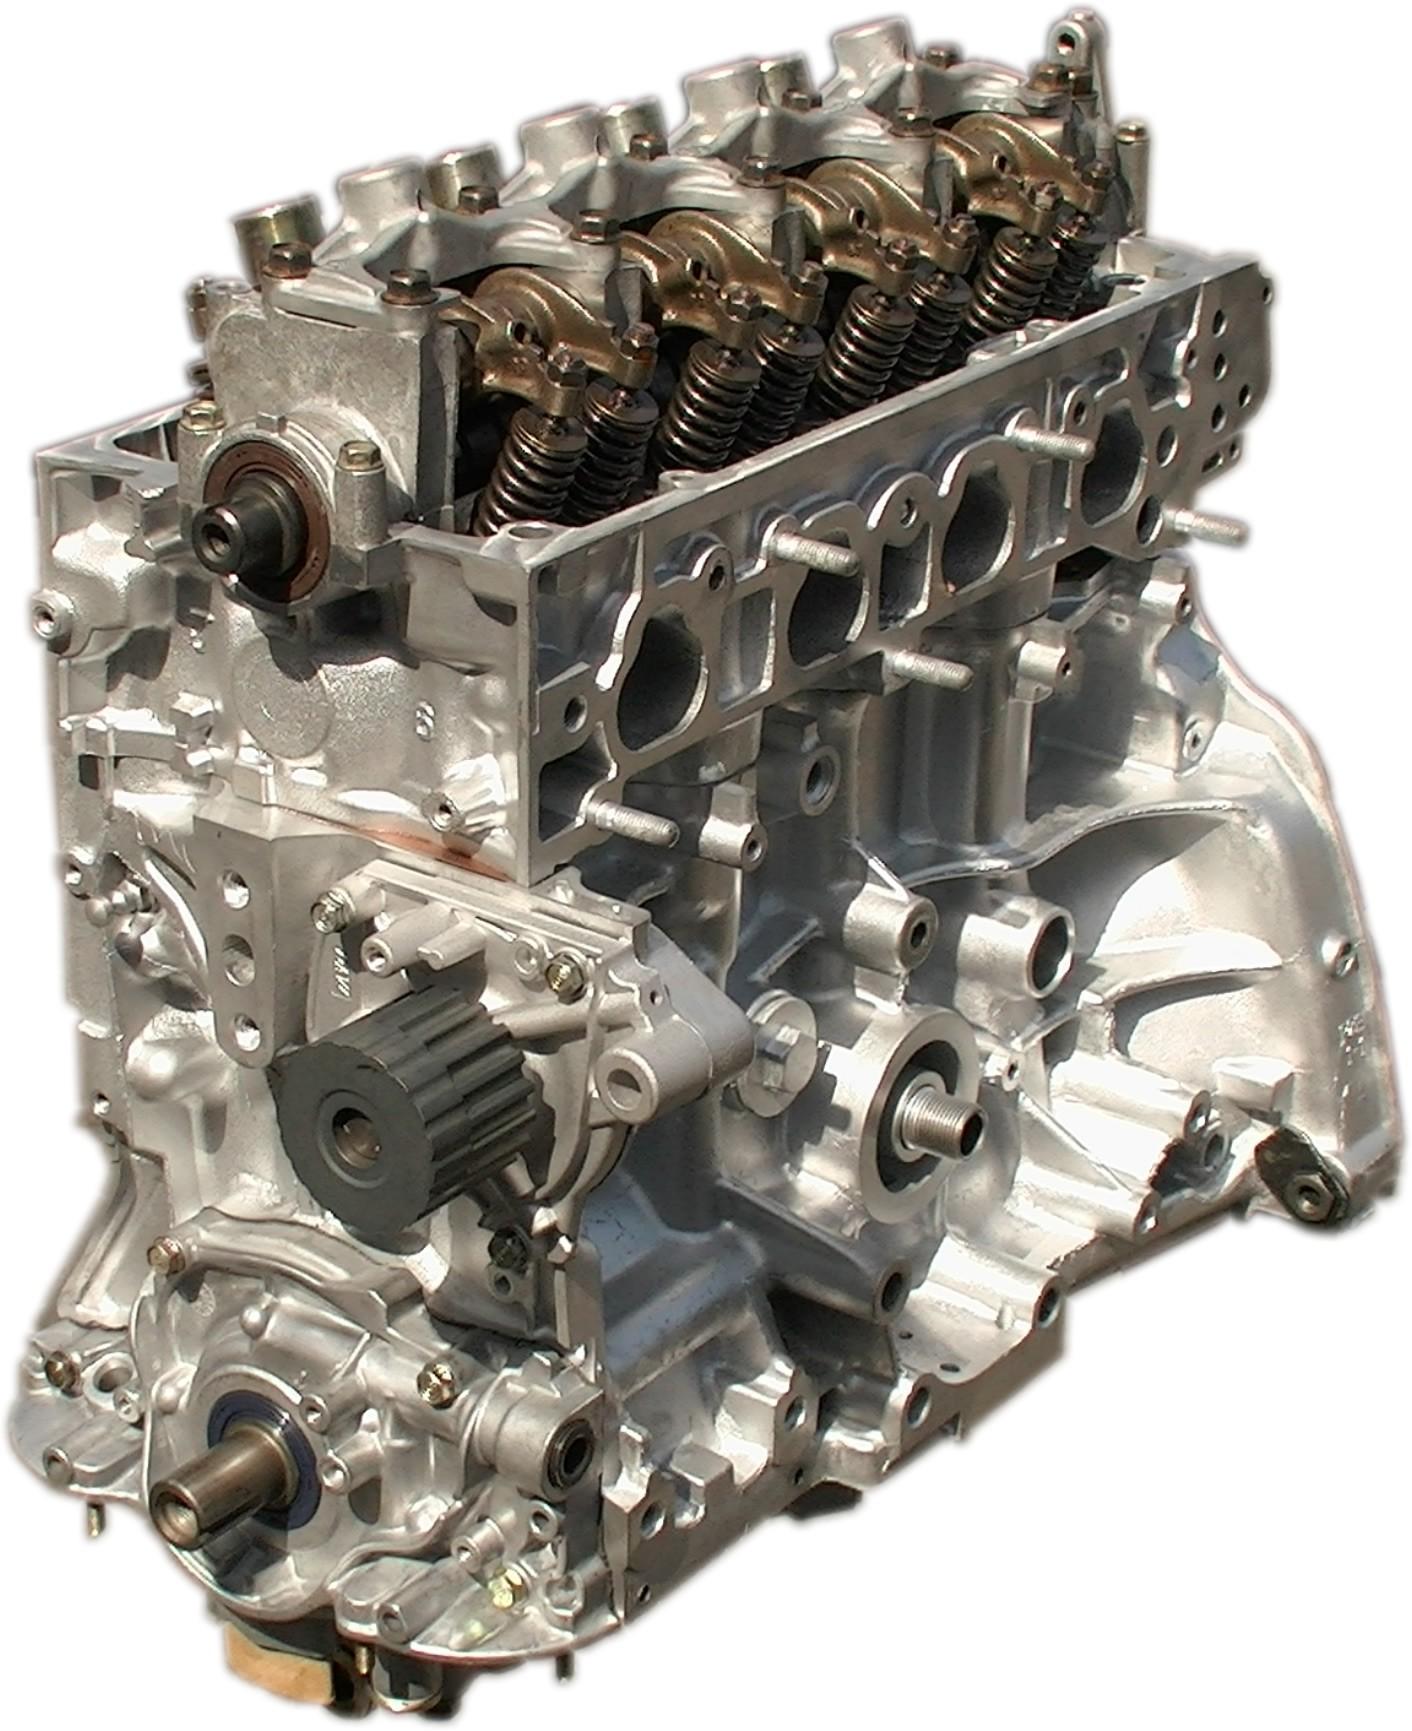 1997 honda civic engine diagram warehouse wiring rebuilt 96 00 1 6l non vtec  kar king auto